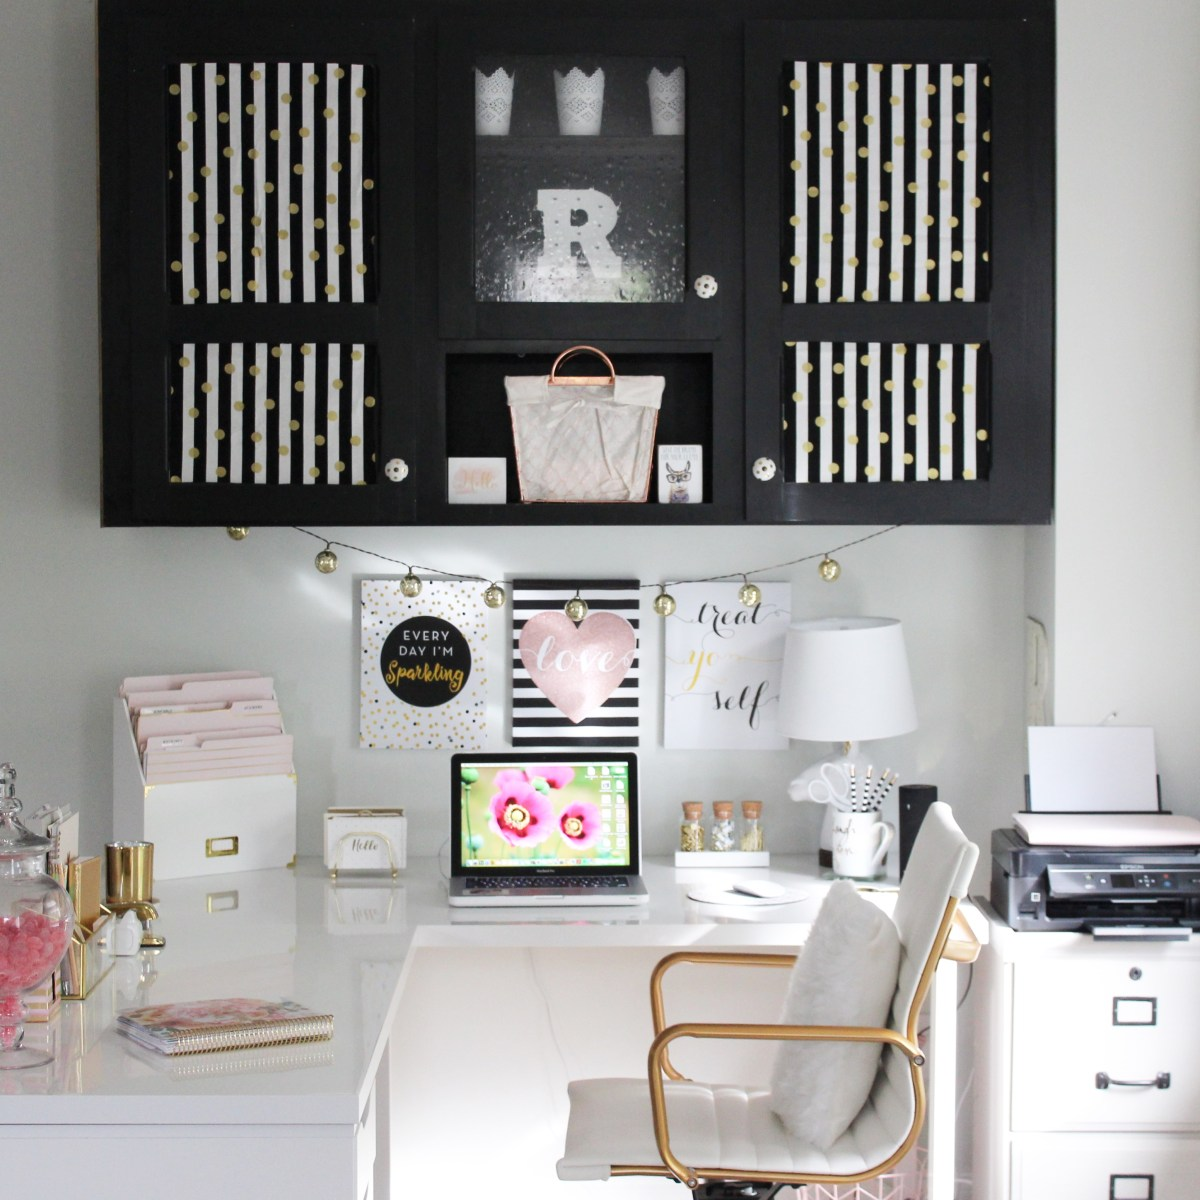 Robyn's Creative Nesting Corner